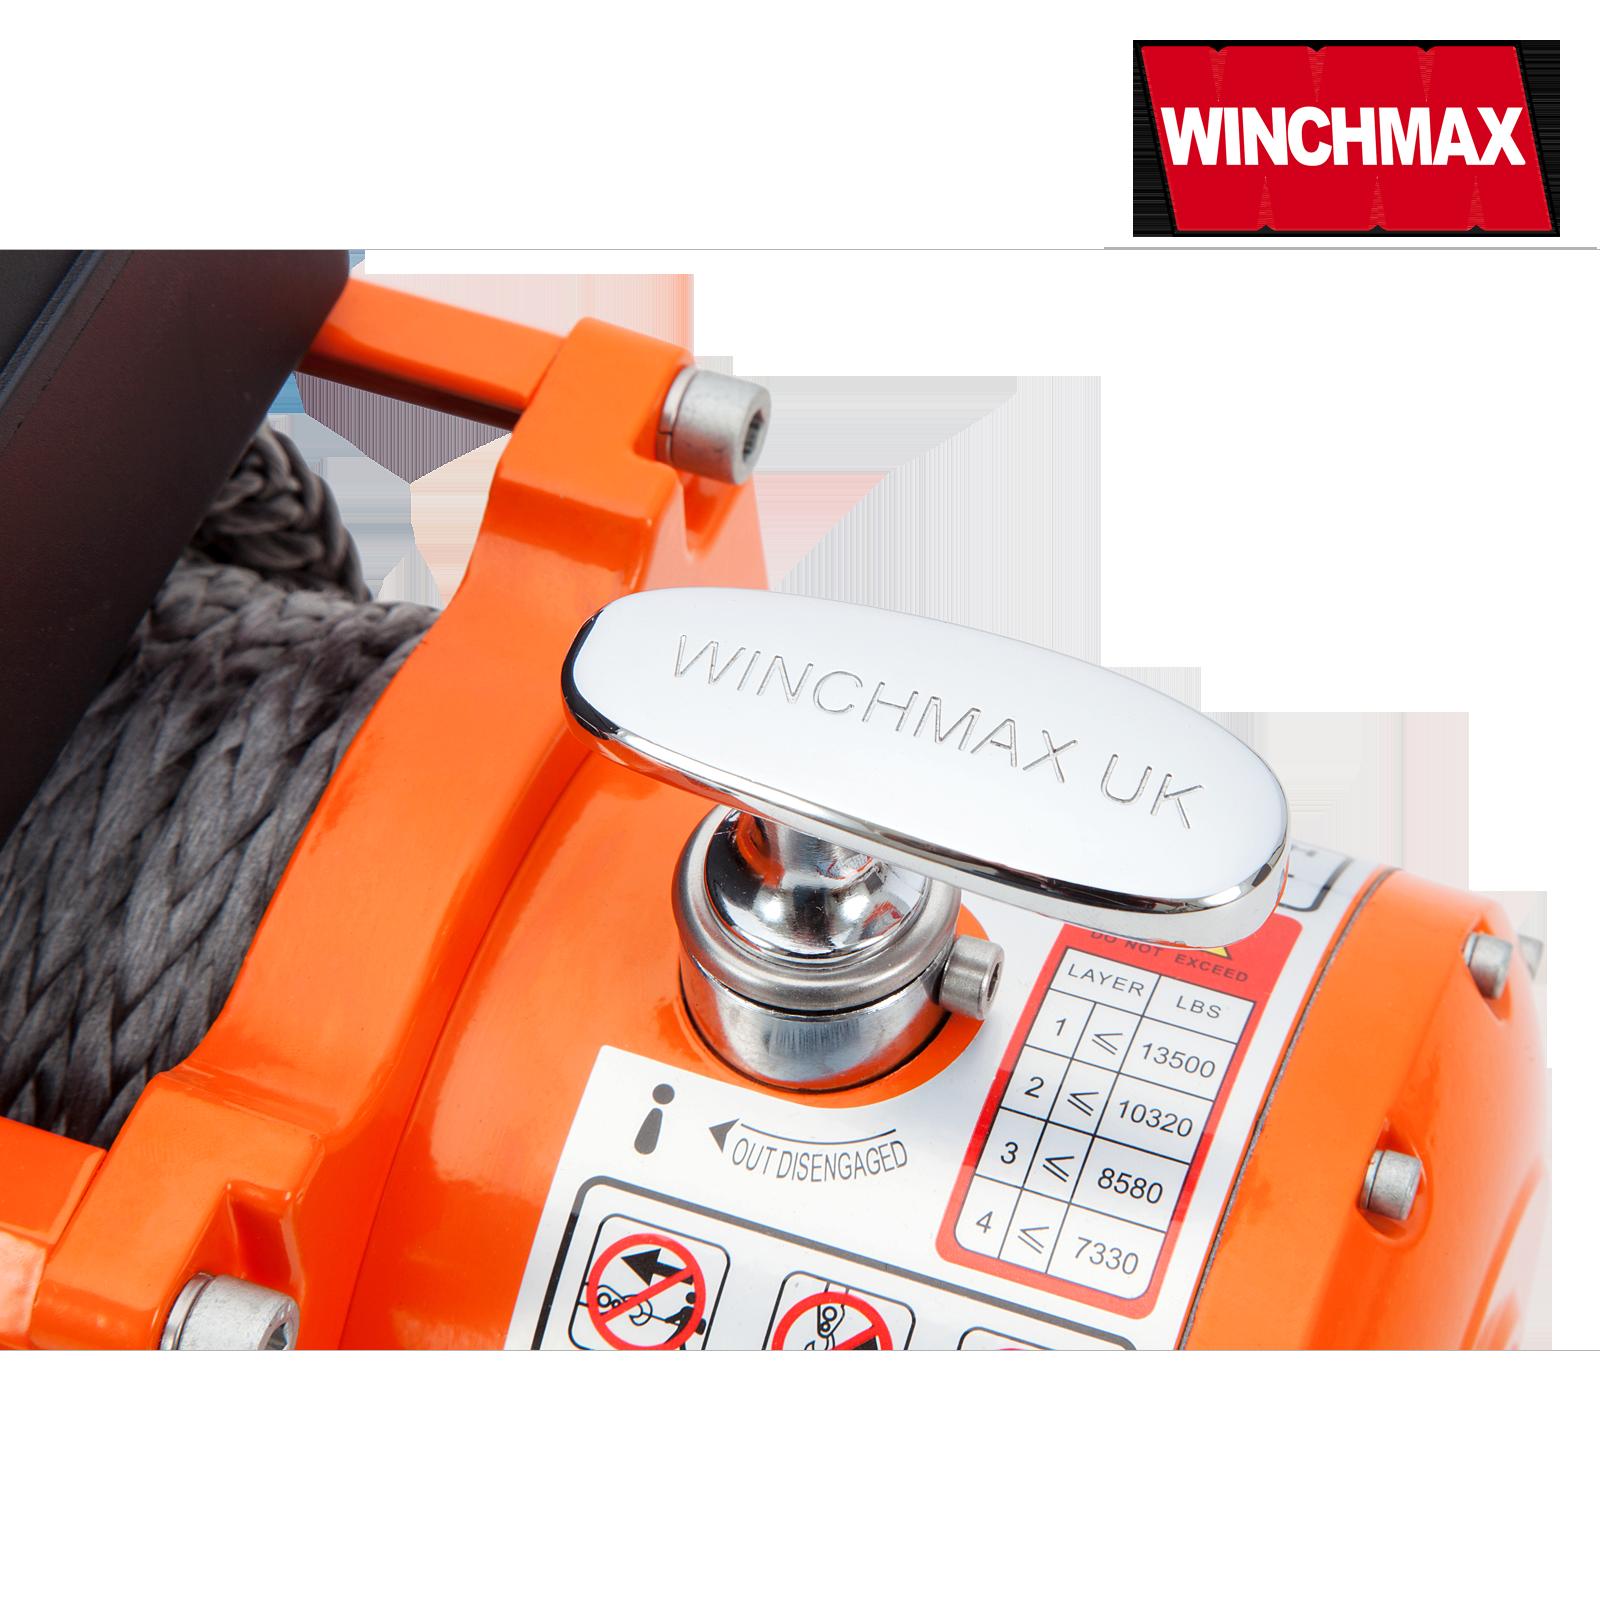 Wm1350012vsyn winchmax 515